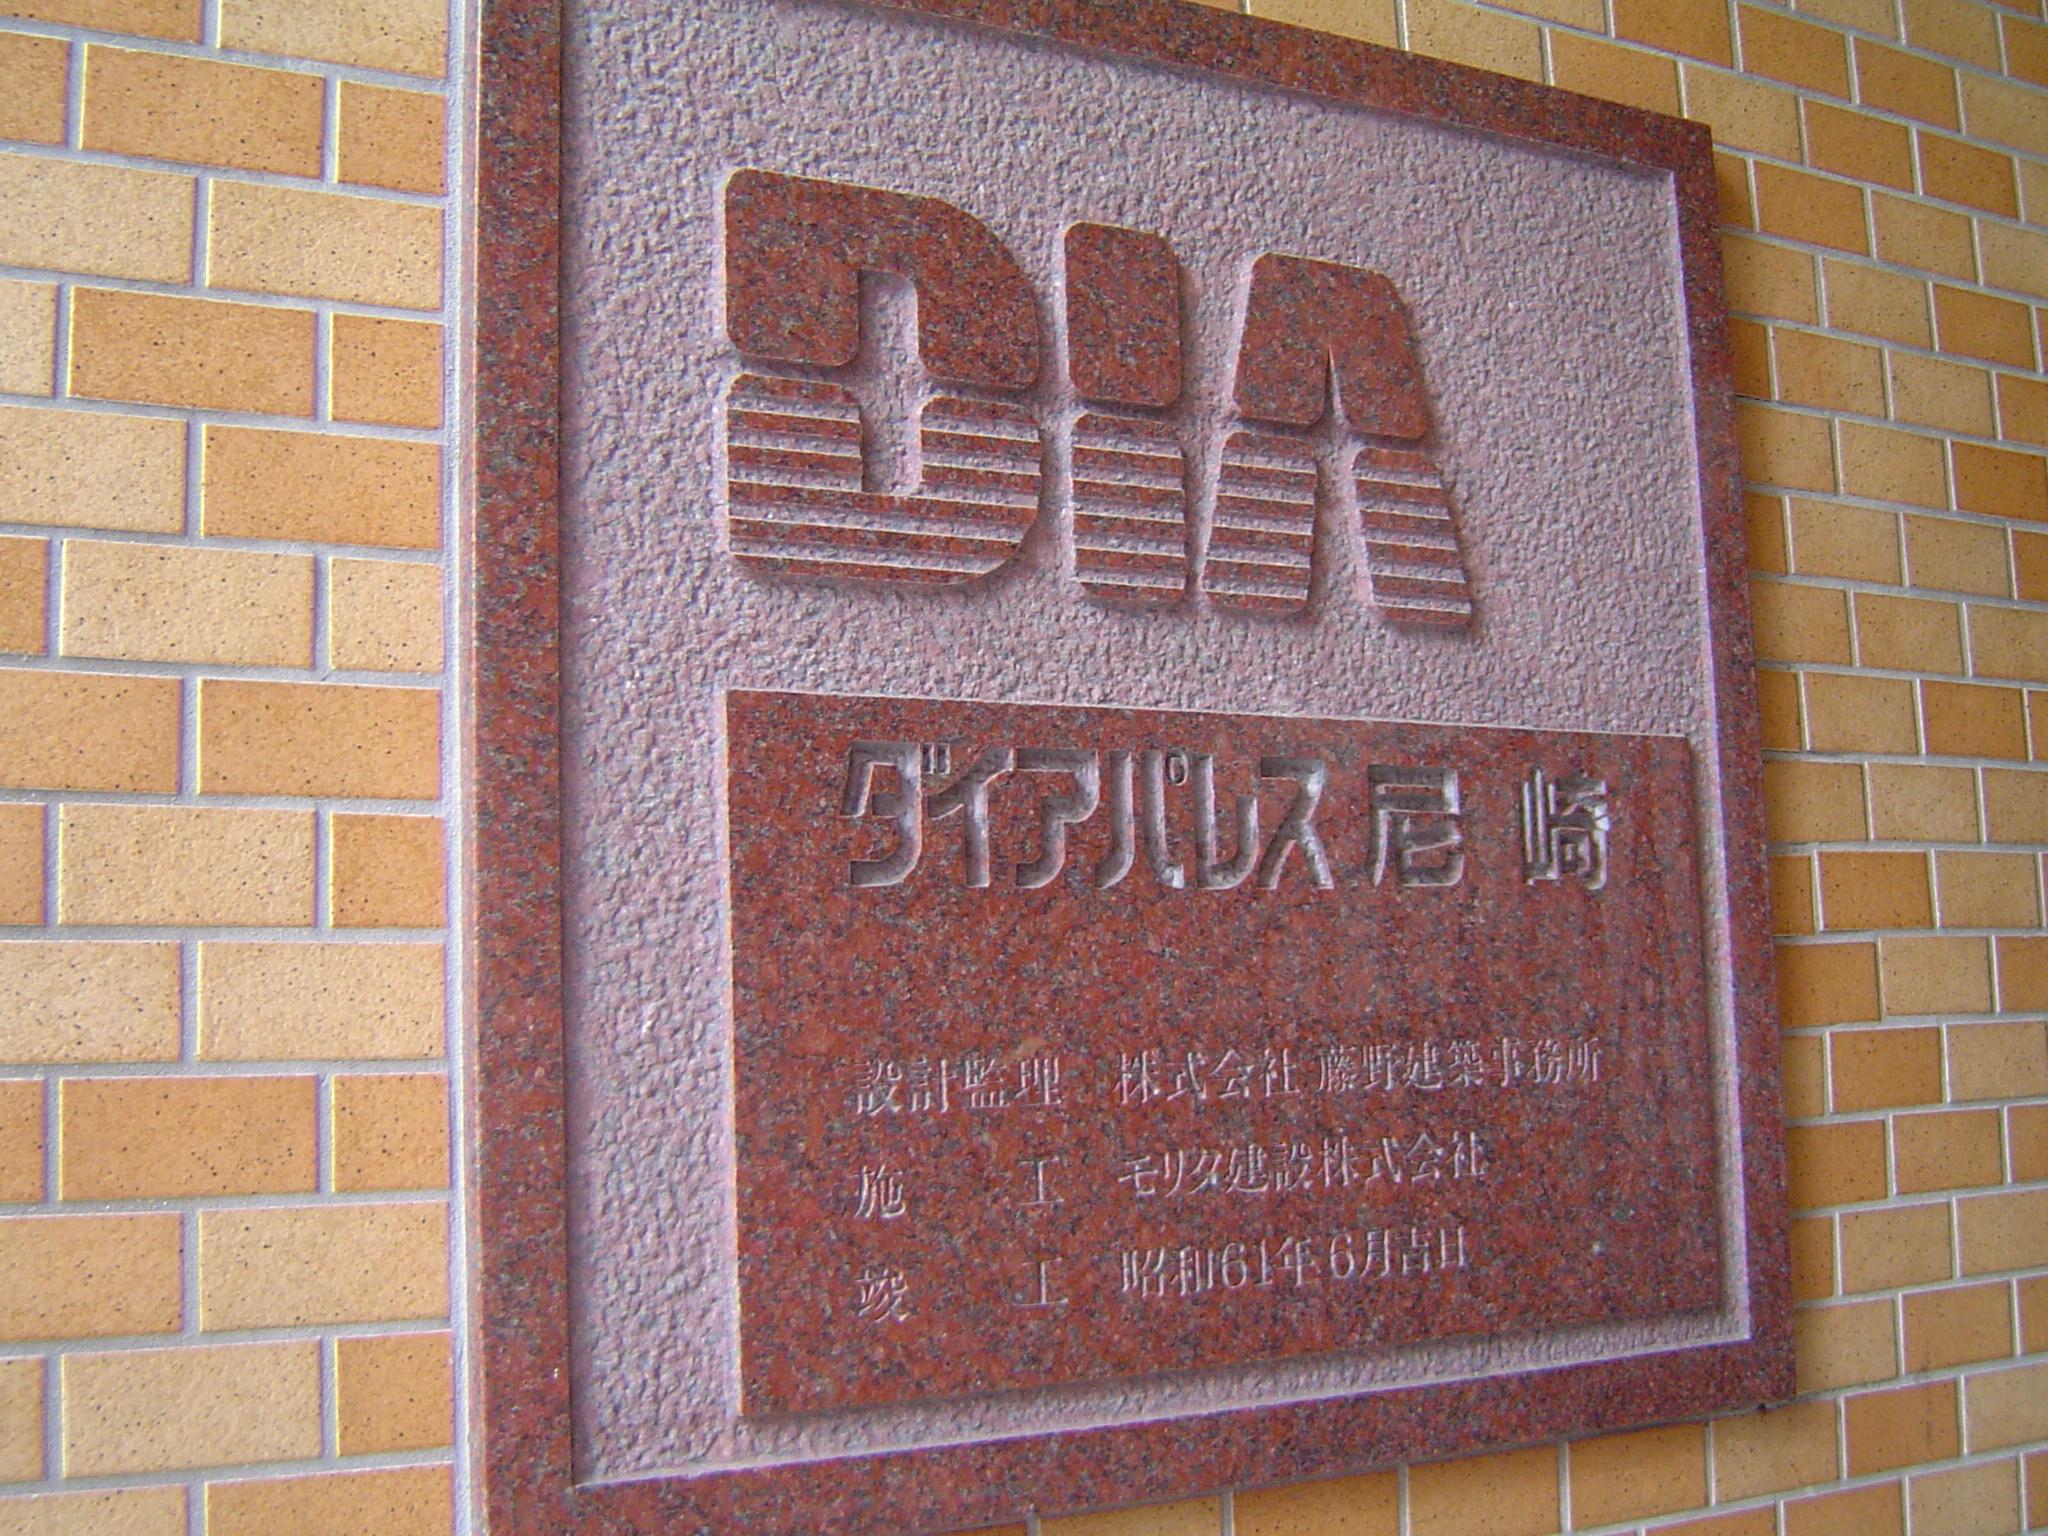 DSC07629.JPG